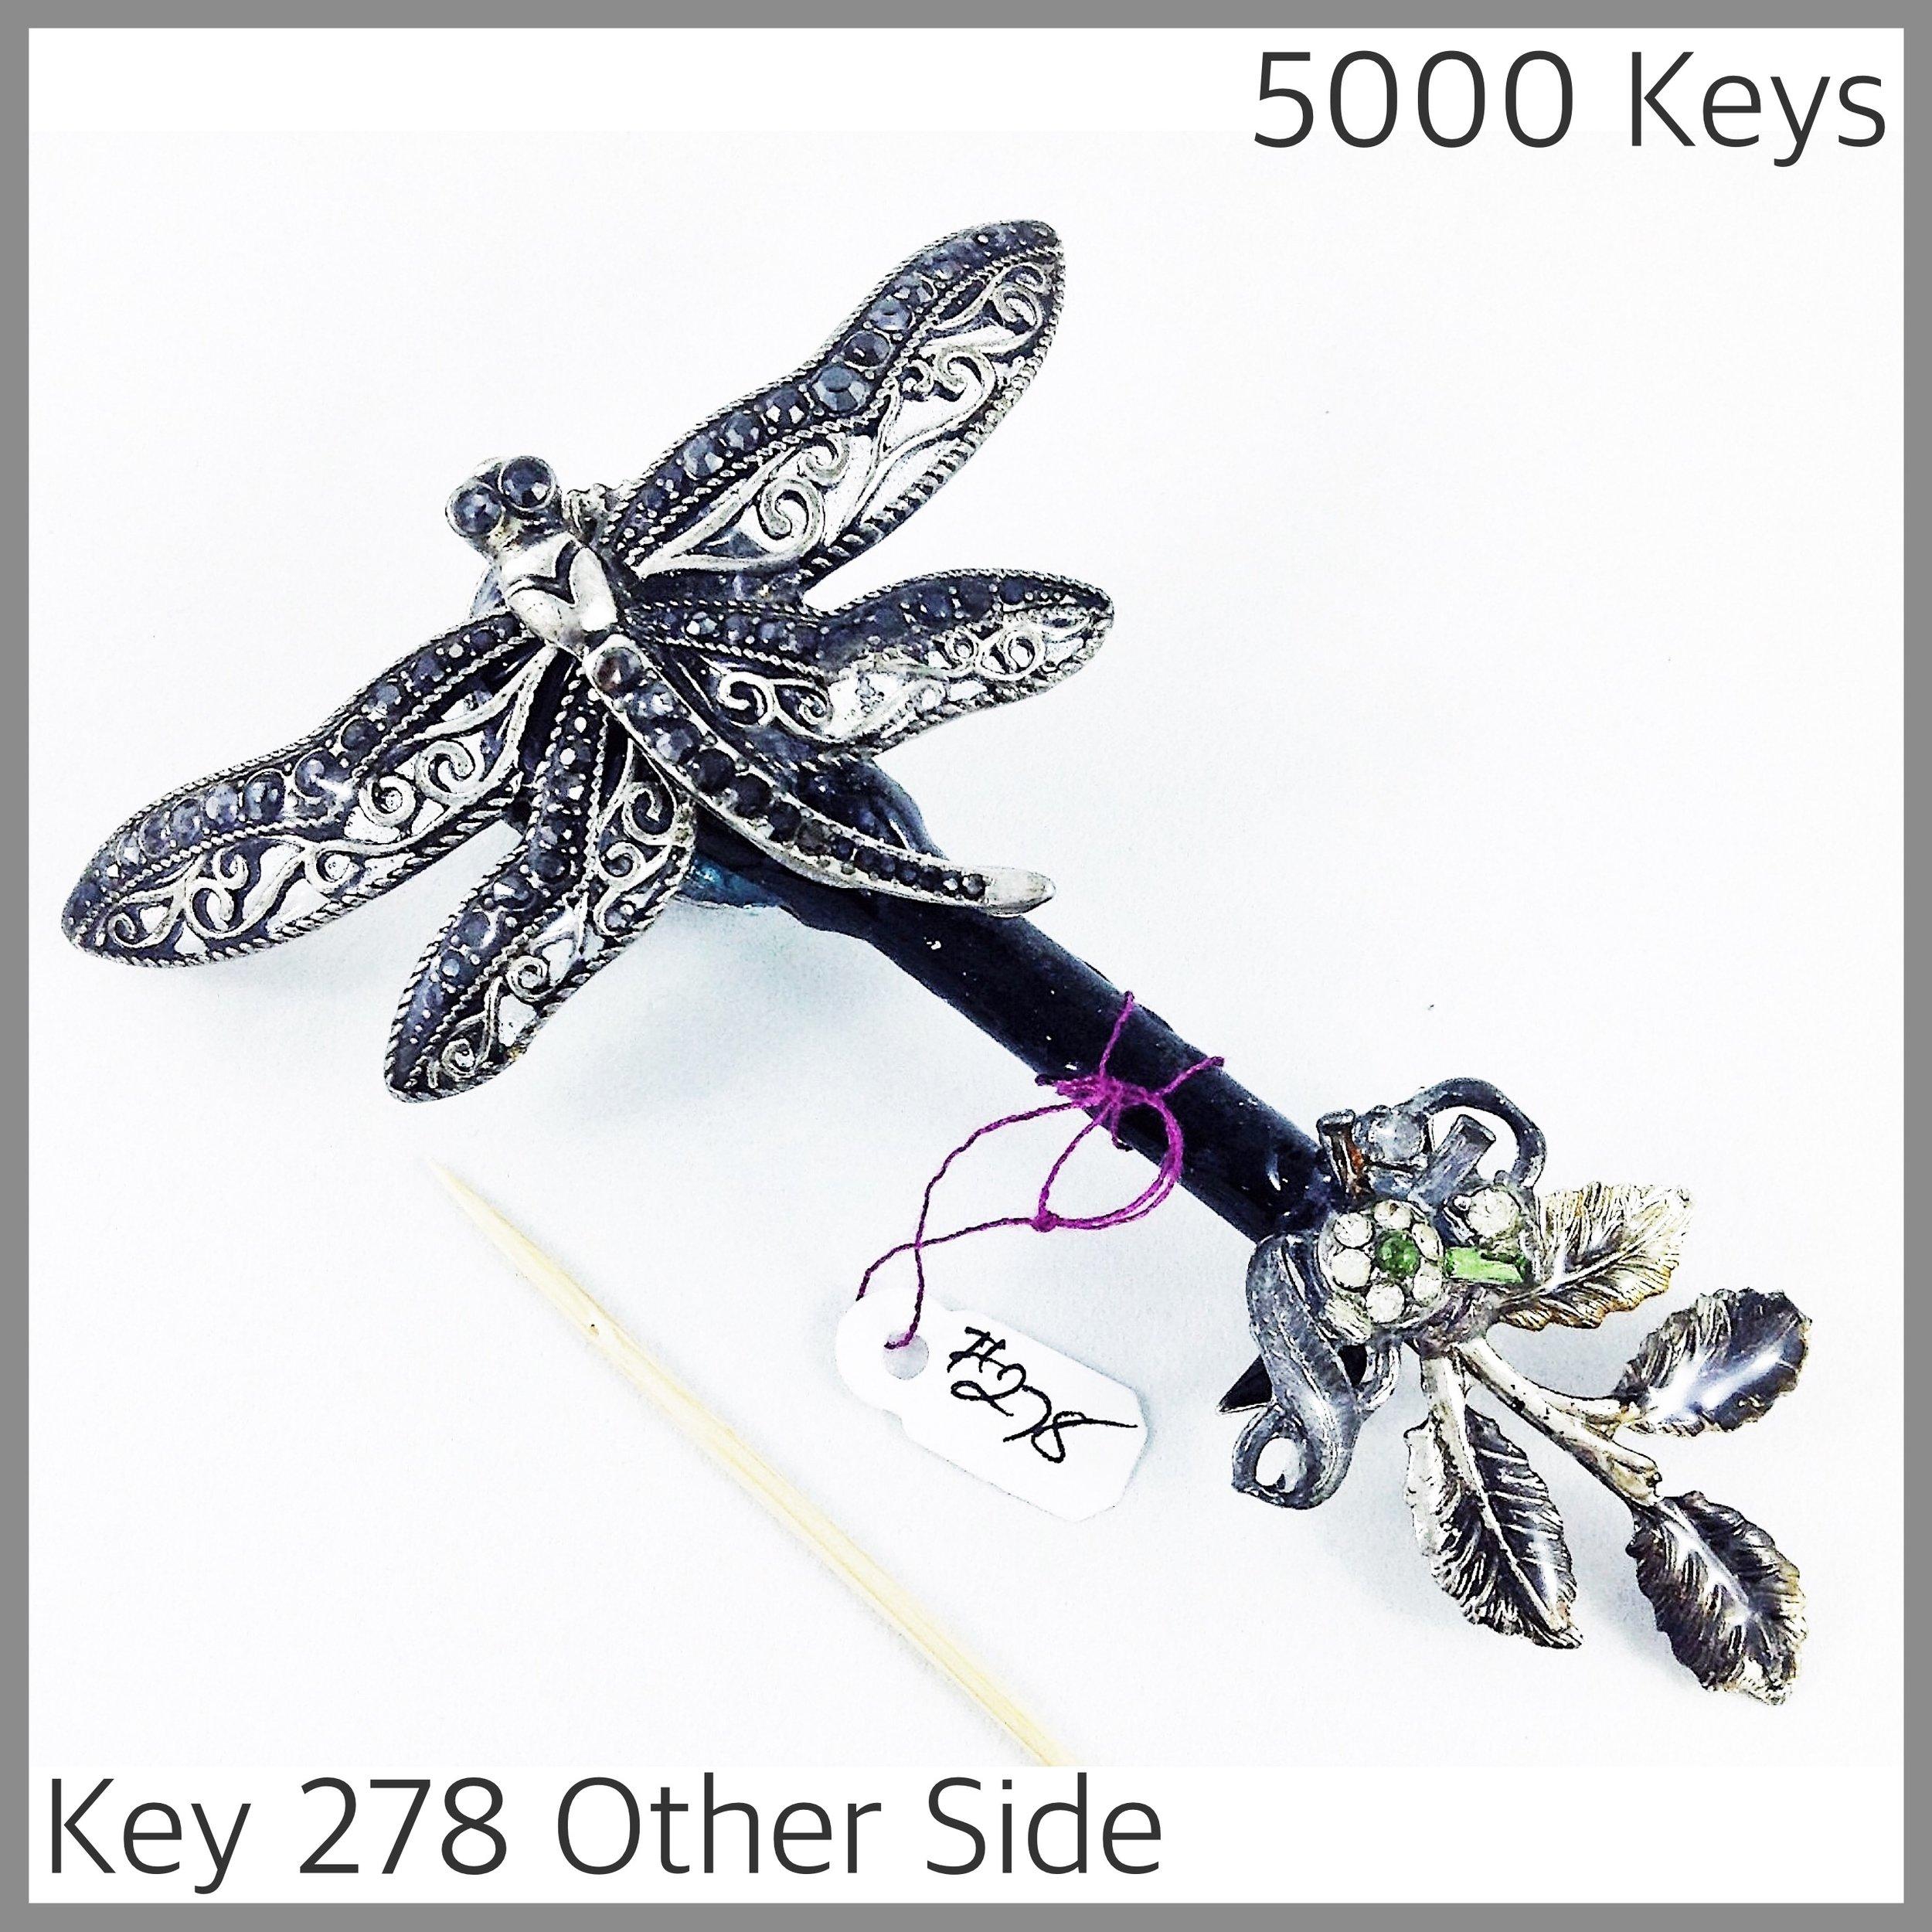 Key 278 other side - 1.JPG